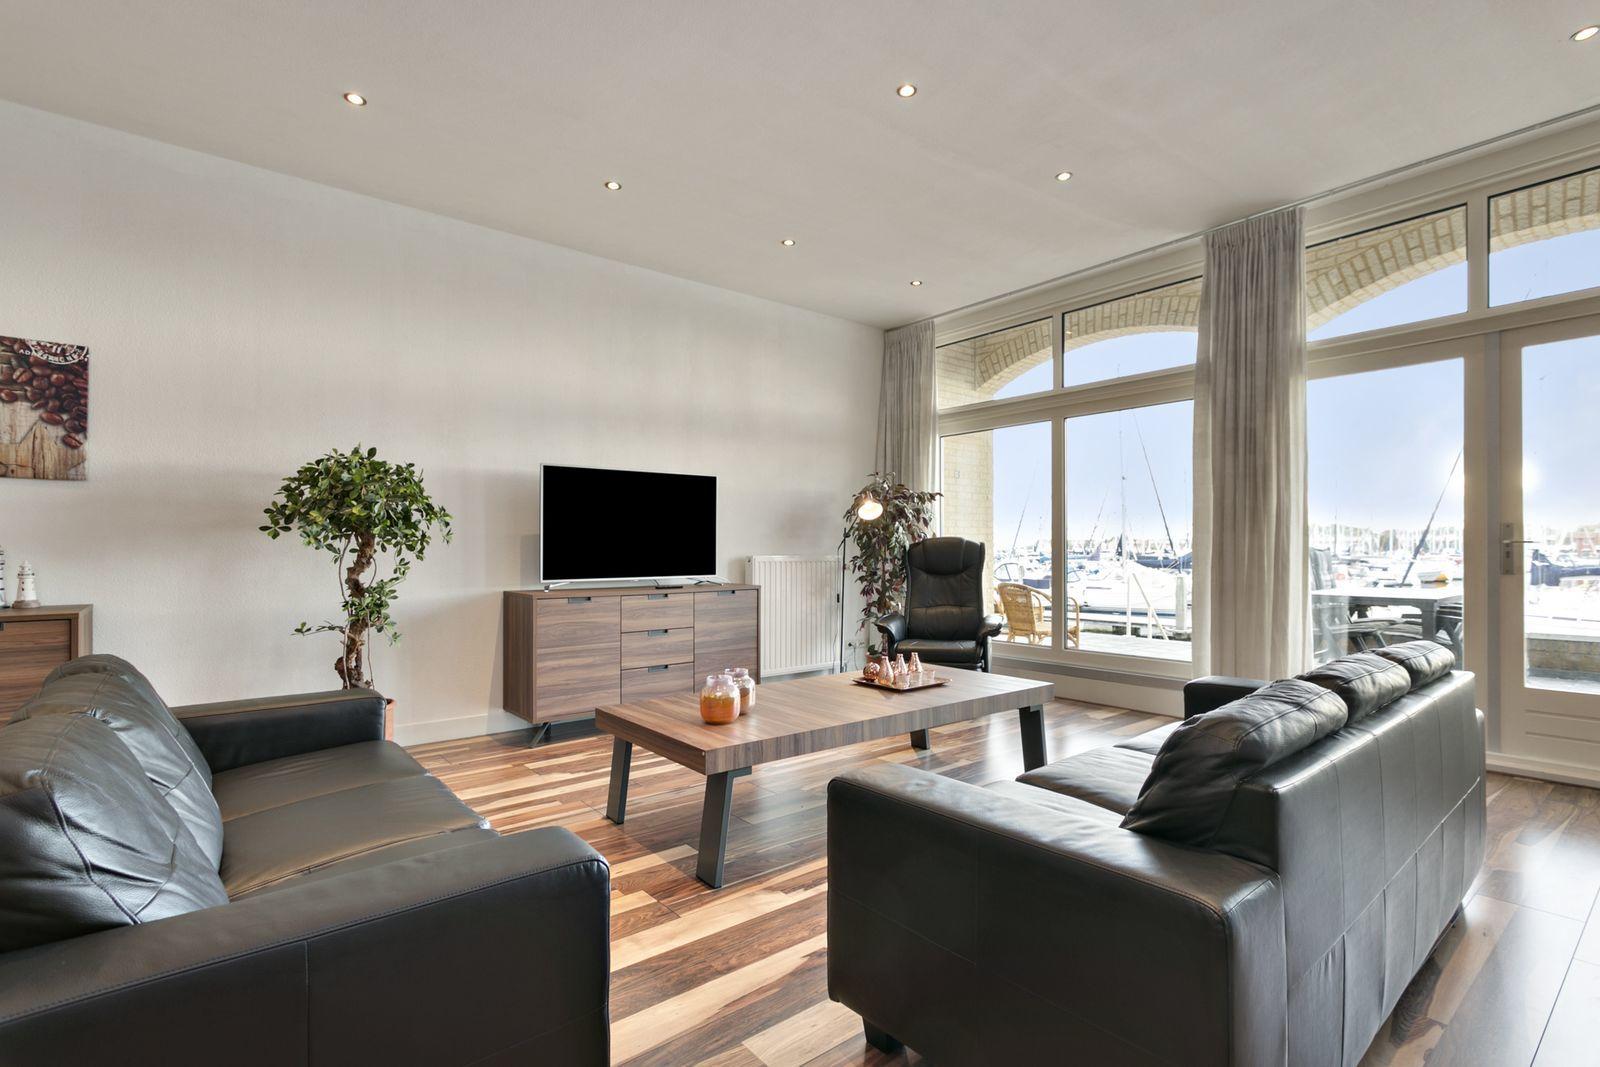 Appartement Port Zélande Marina 8 personen - Ouddorp (2E)